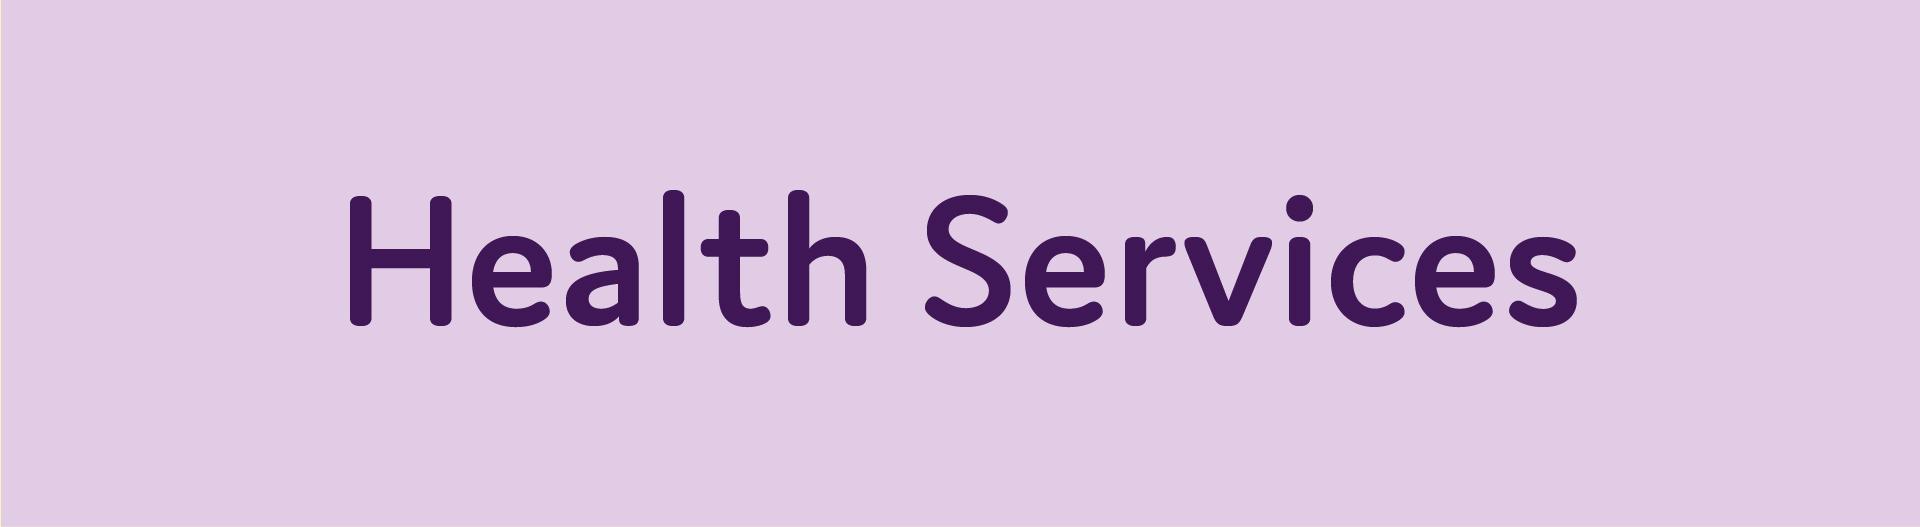 Health Service-01